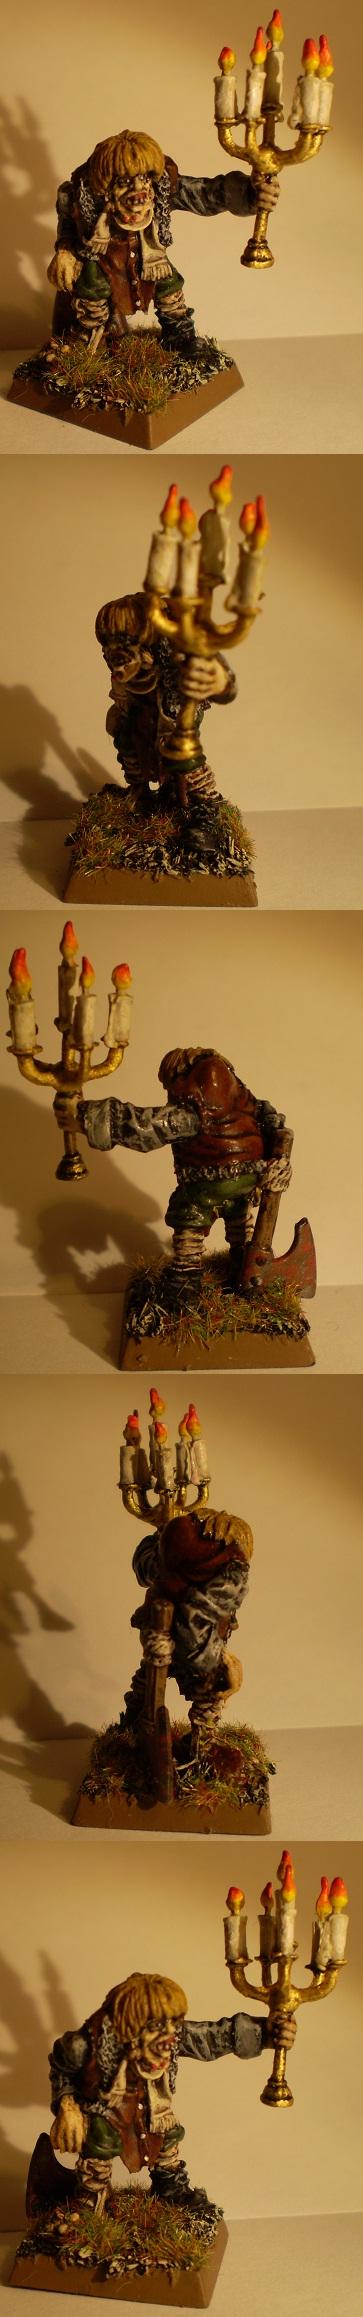 Mordheim dreg 1 - Koulol